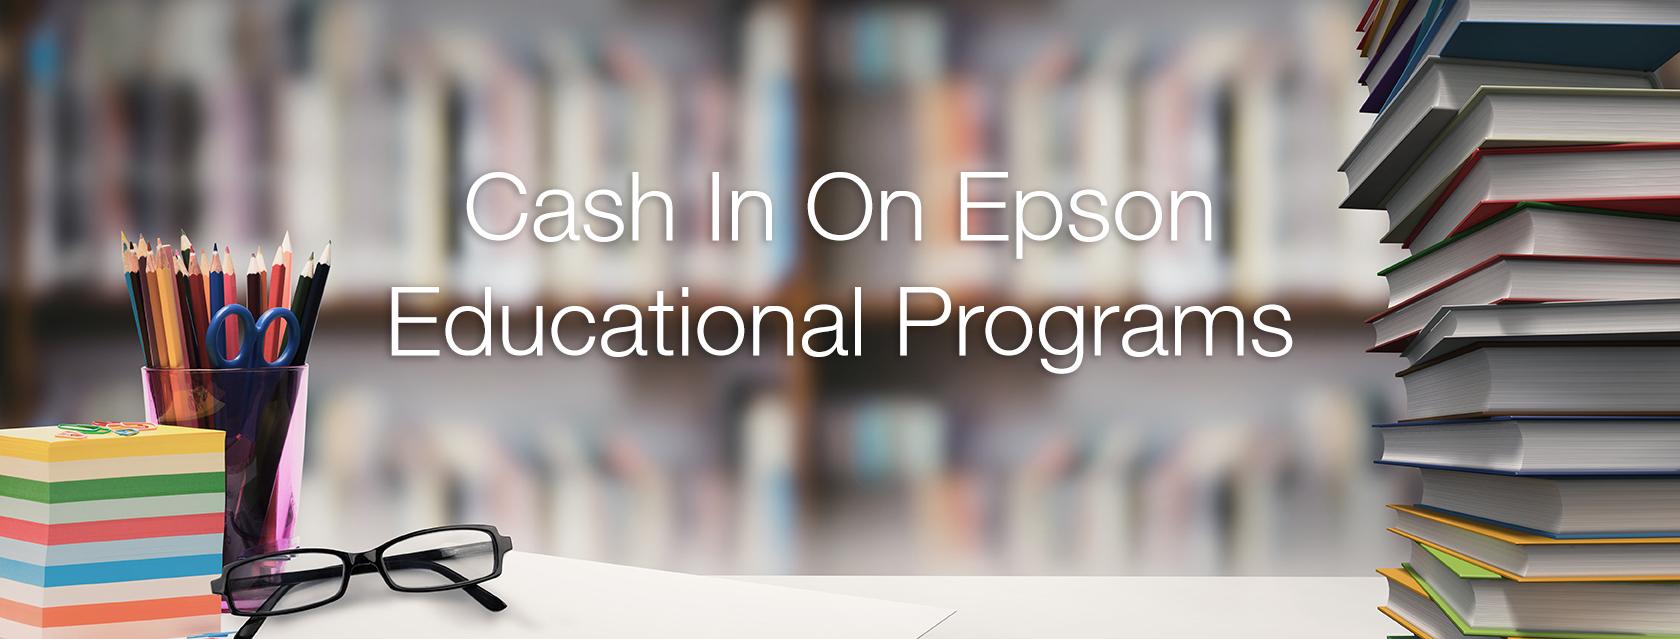 education-banner01